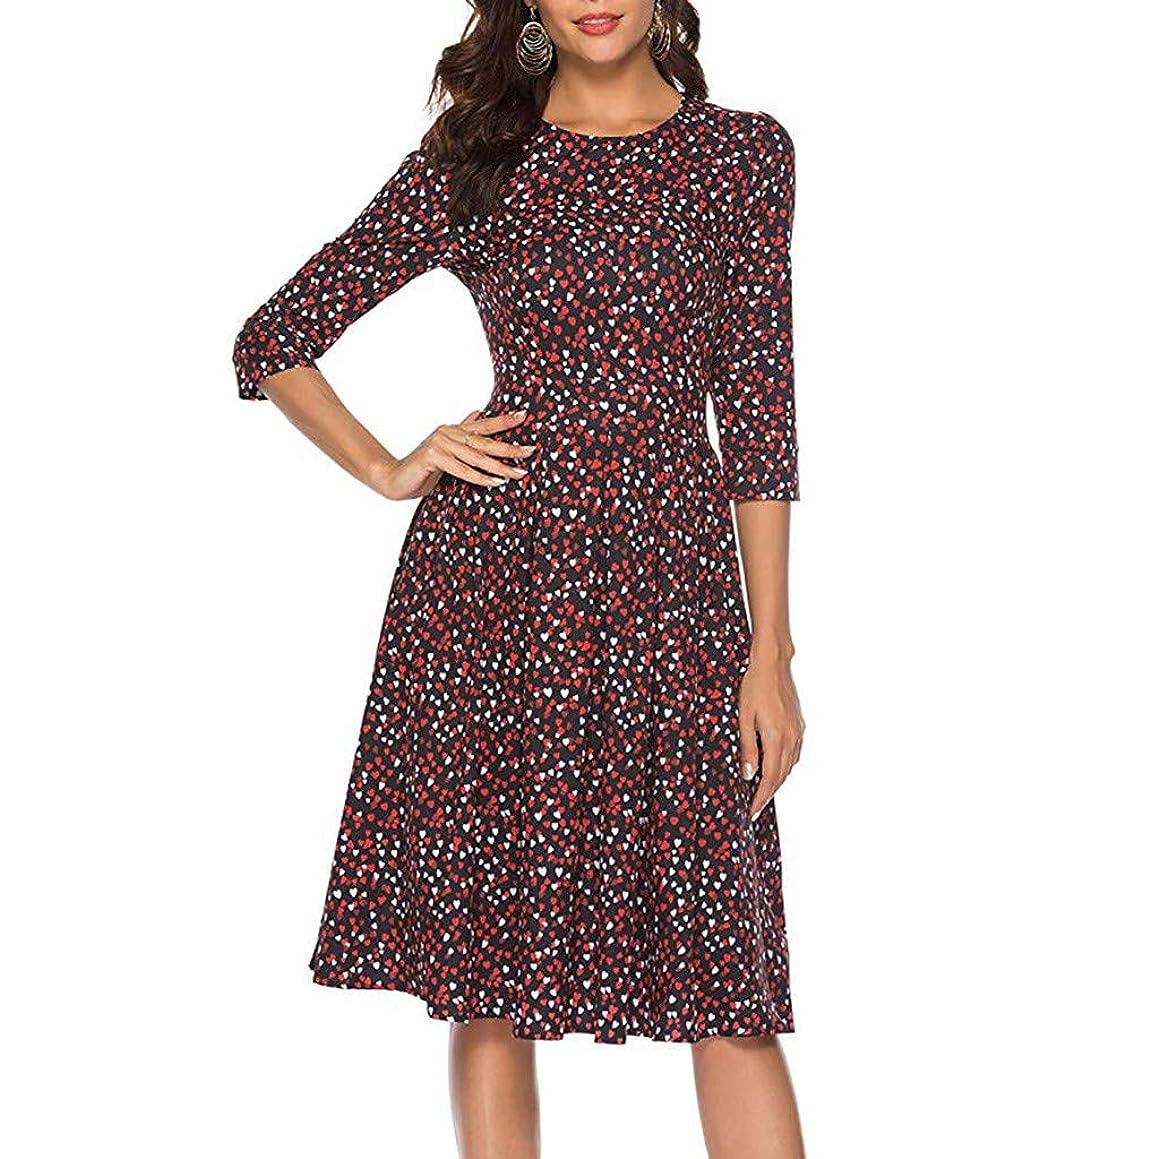 Xinantime Women 3/4 Sleeve Midi Evening Dress Floral Vintage Dress Elegant Party Club Midi Dress